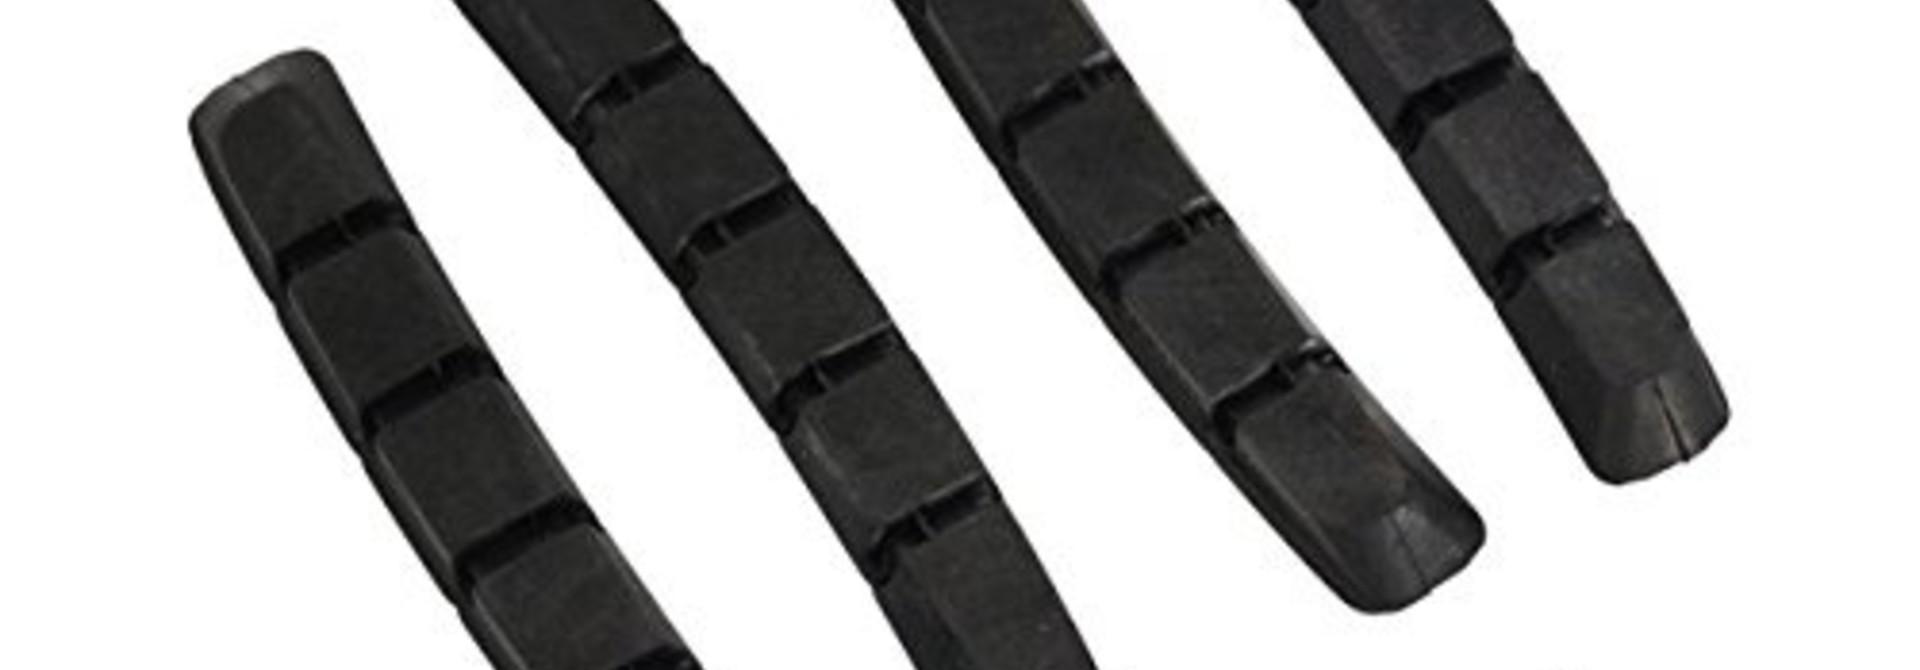 Shimano M70CT4 (severe) (2pair) Shoe pads for cartridge-type brake shoes